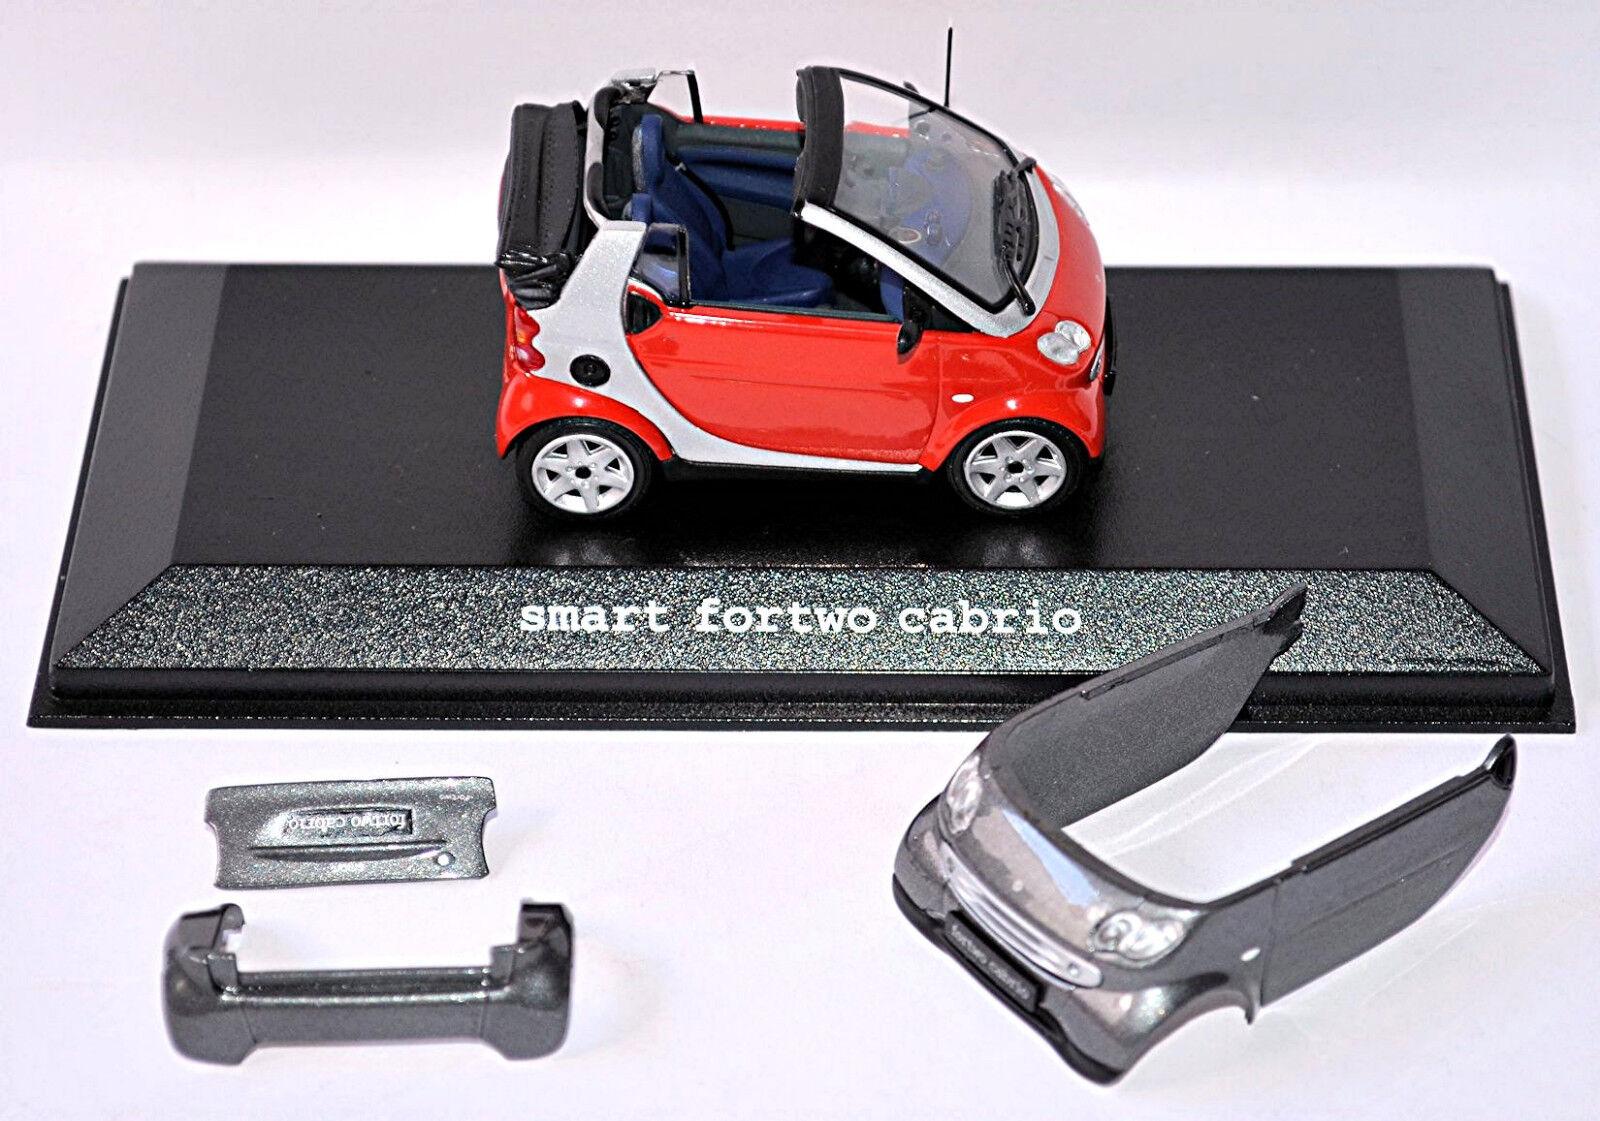 Smart Fortwo Cabrio 2003-07 Facelift A450 rot  grau phat rot  bay grau 1 43  | Gute Qualität